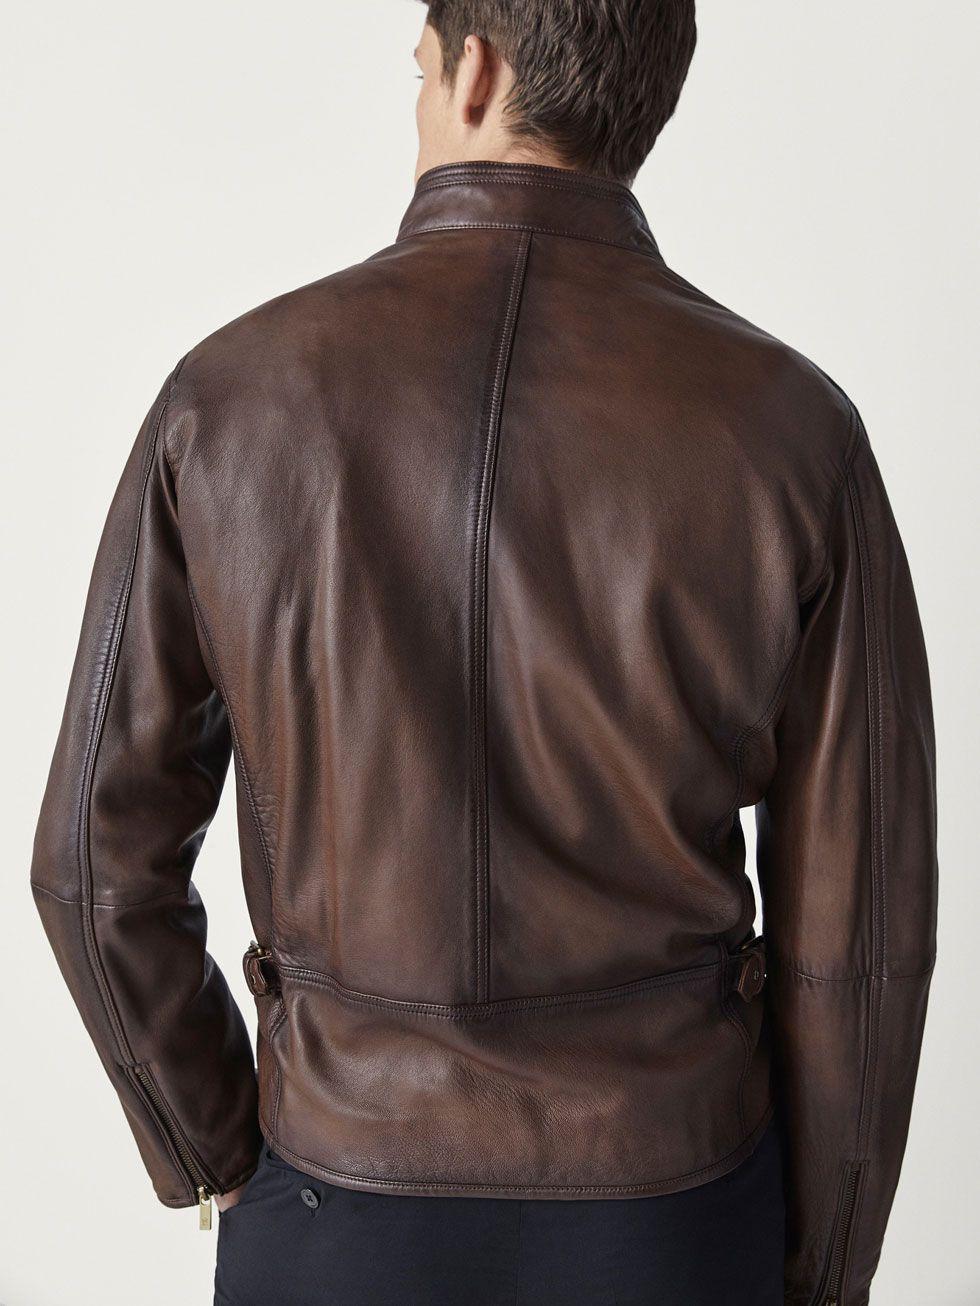 Blousons en cuir - Vestes - HOMMES - Massimo Dutti   Habits homme ... a09a4983aadb